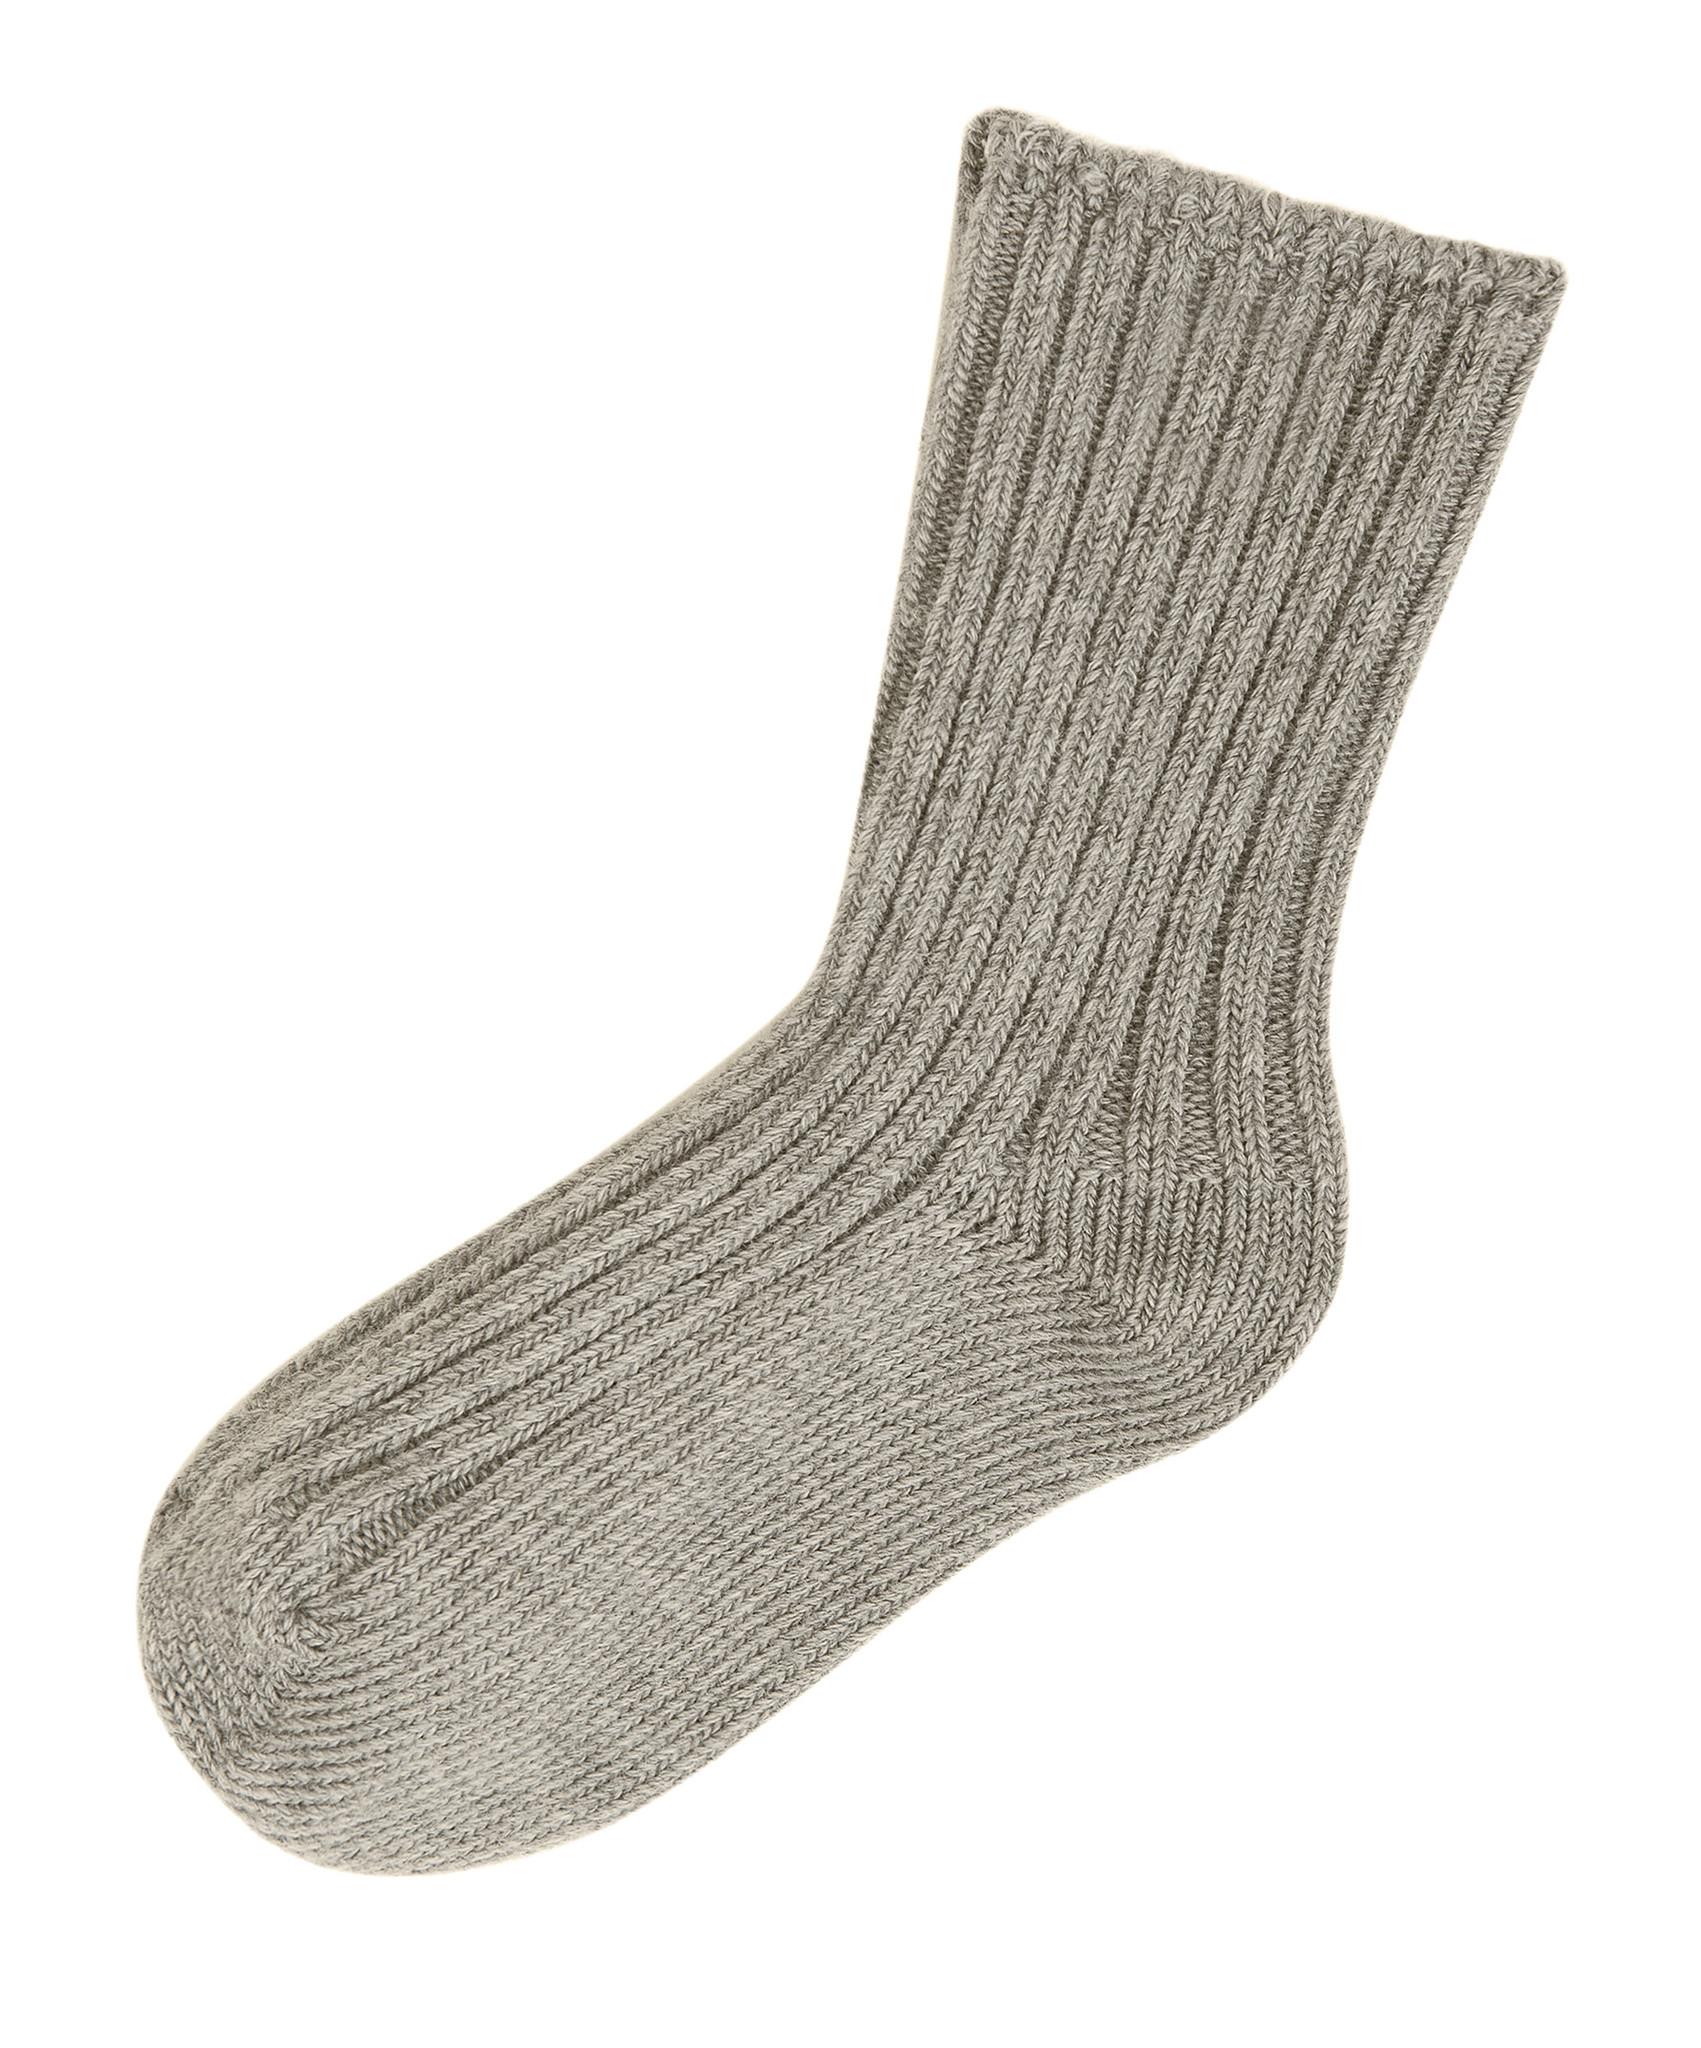 Joha Joha Wollen sokken - Sesam (65443)